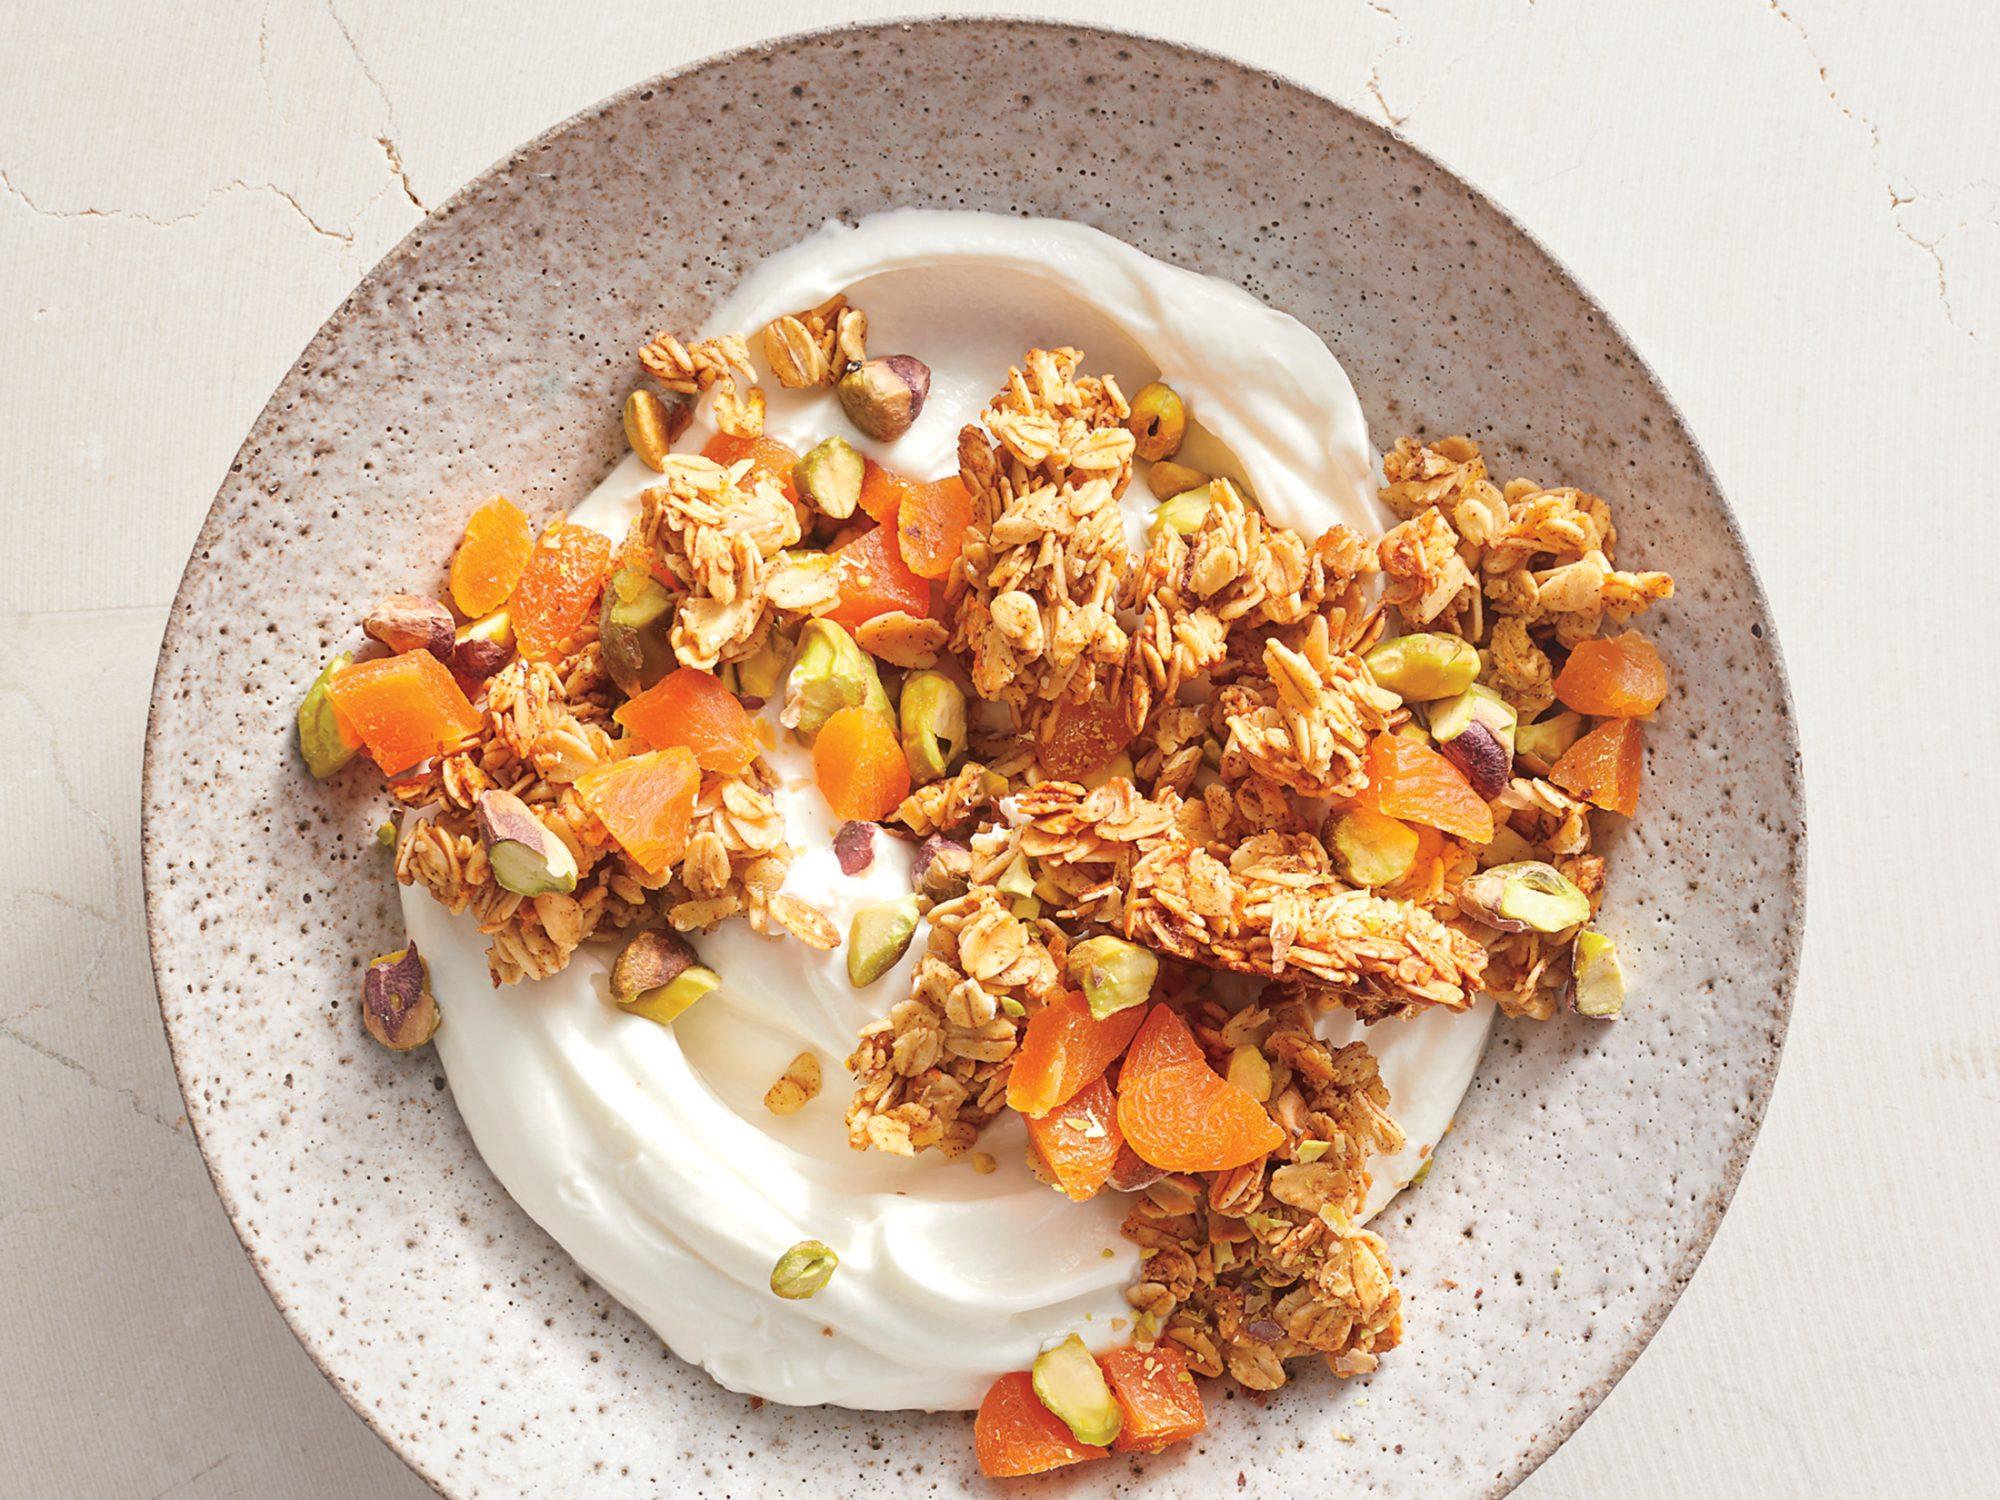 Pistachio Granola with Yogurt